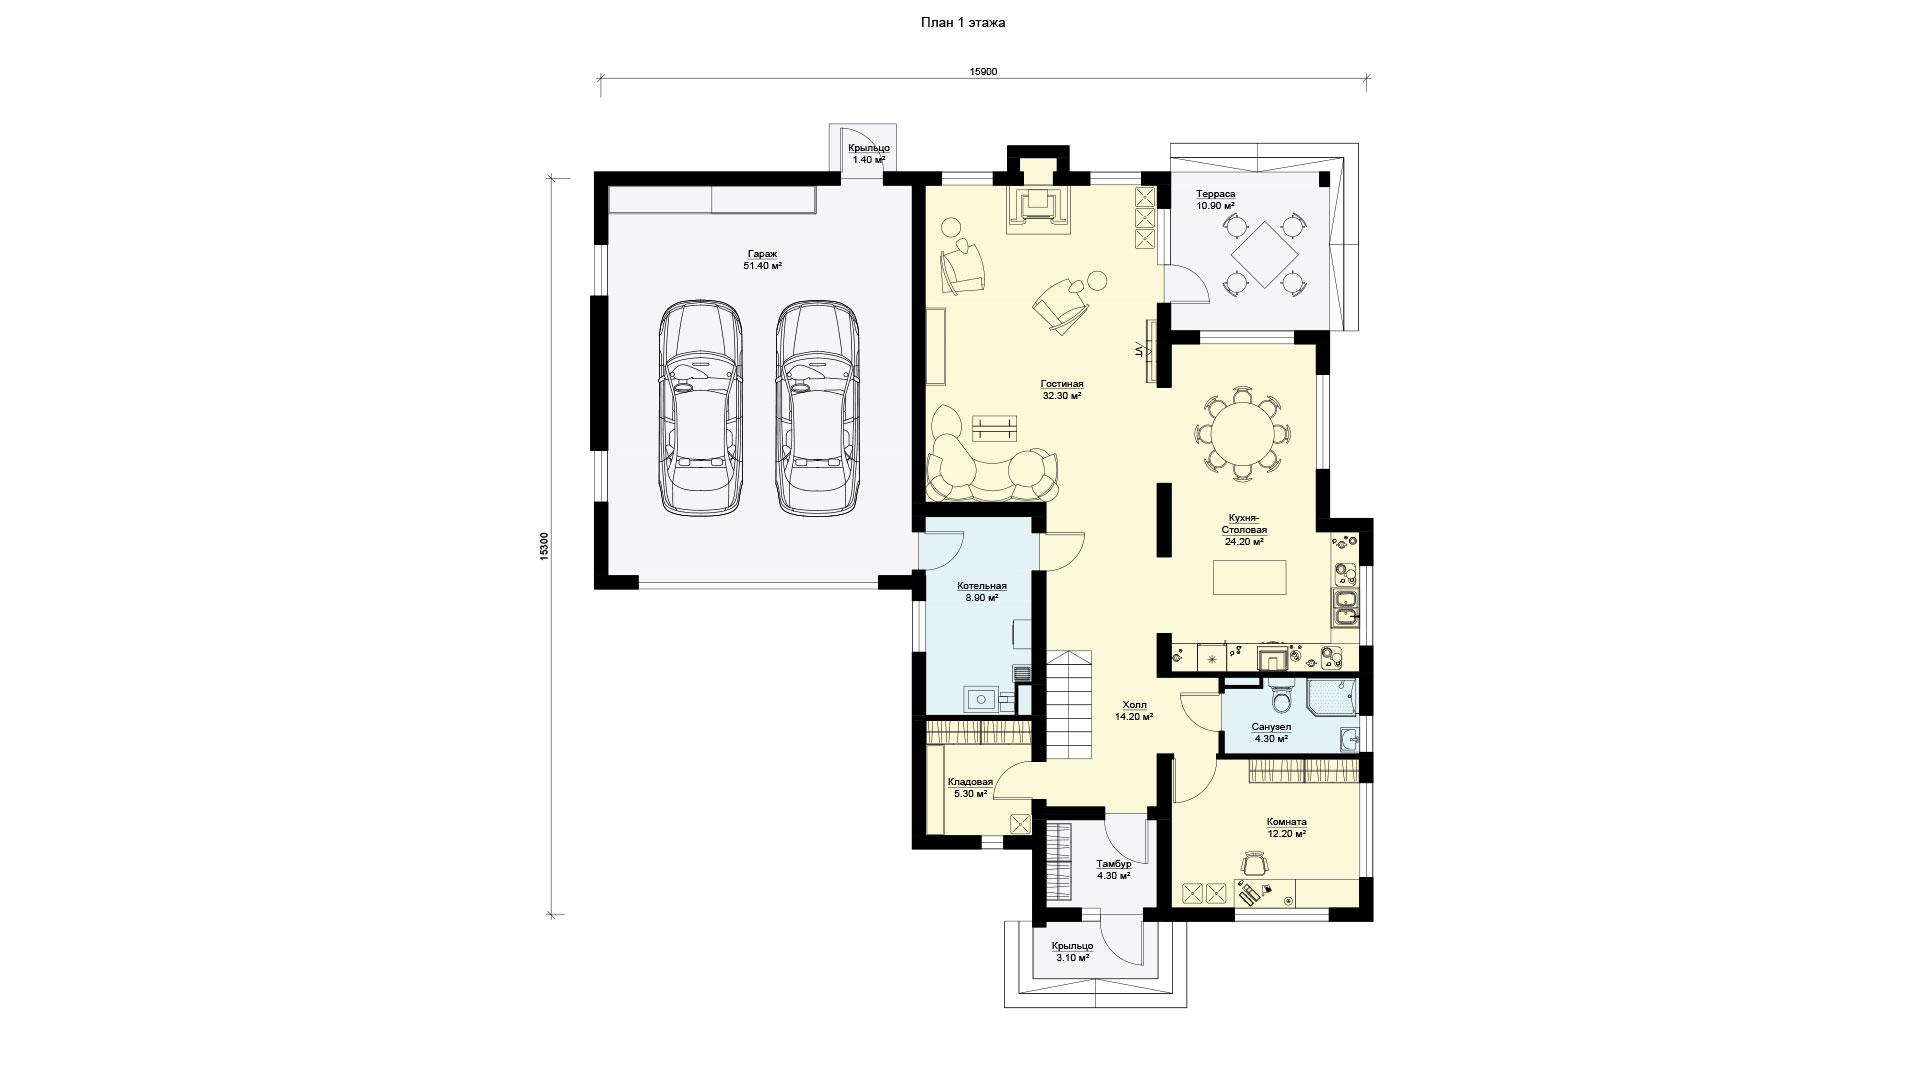 План первого этажа двухэтажного дома 15 на 15, проект БЭНПАН БП-289.